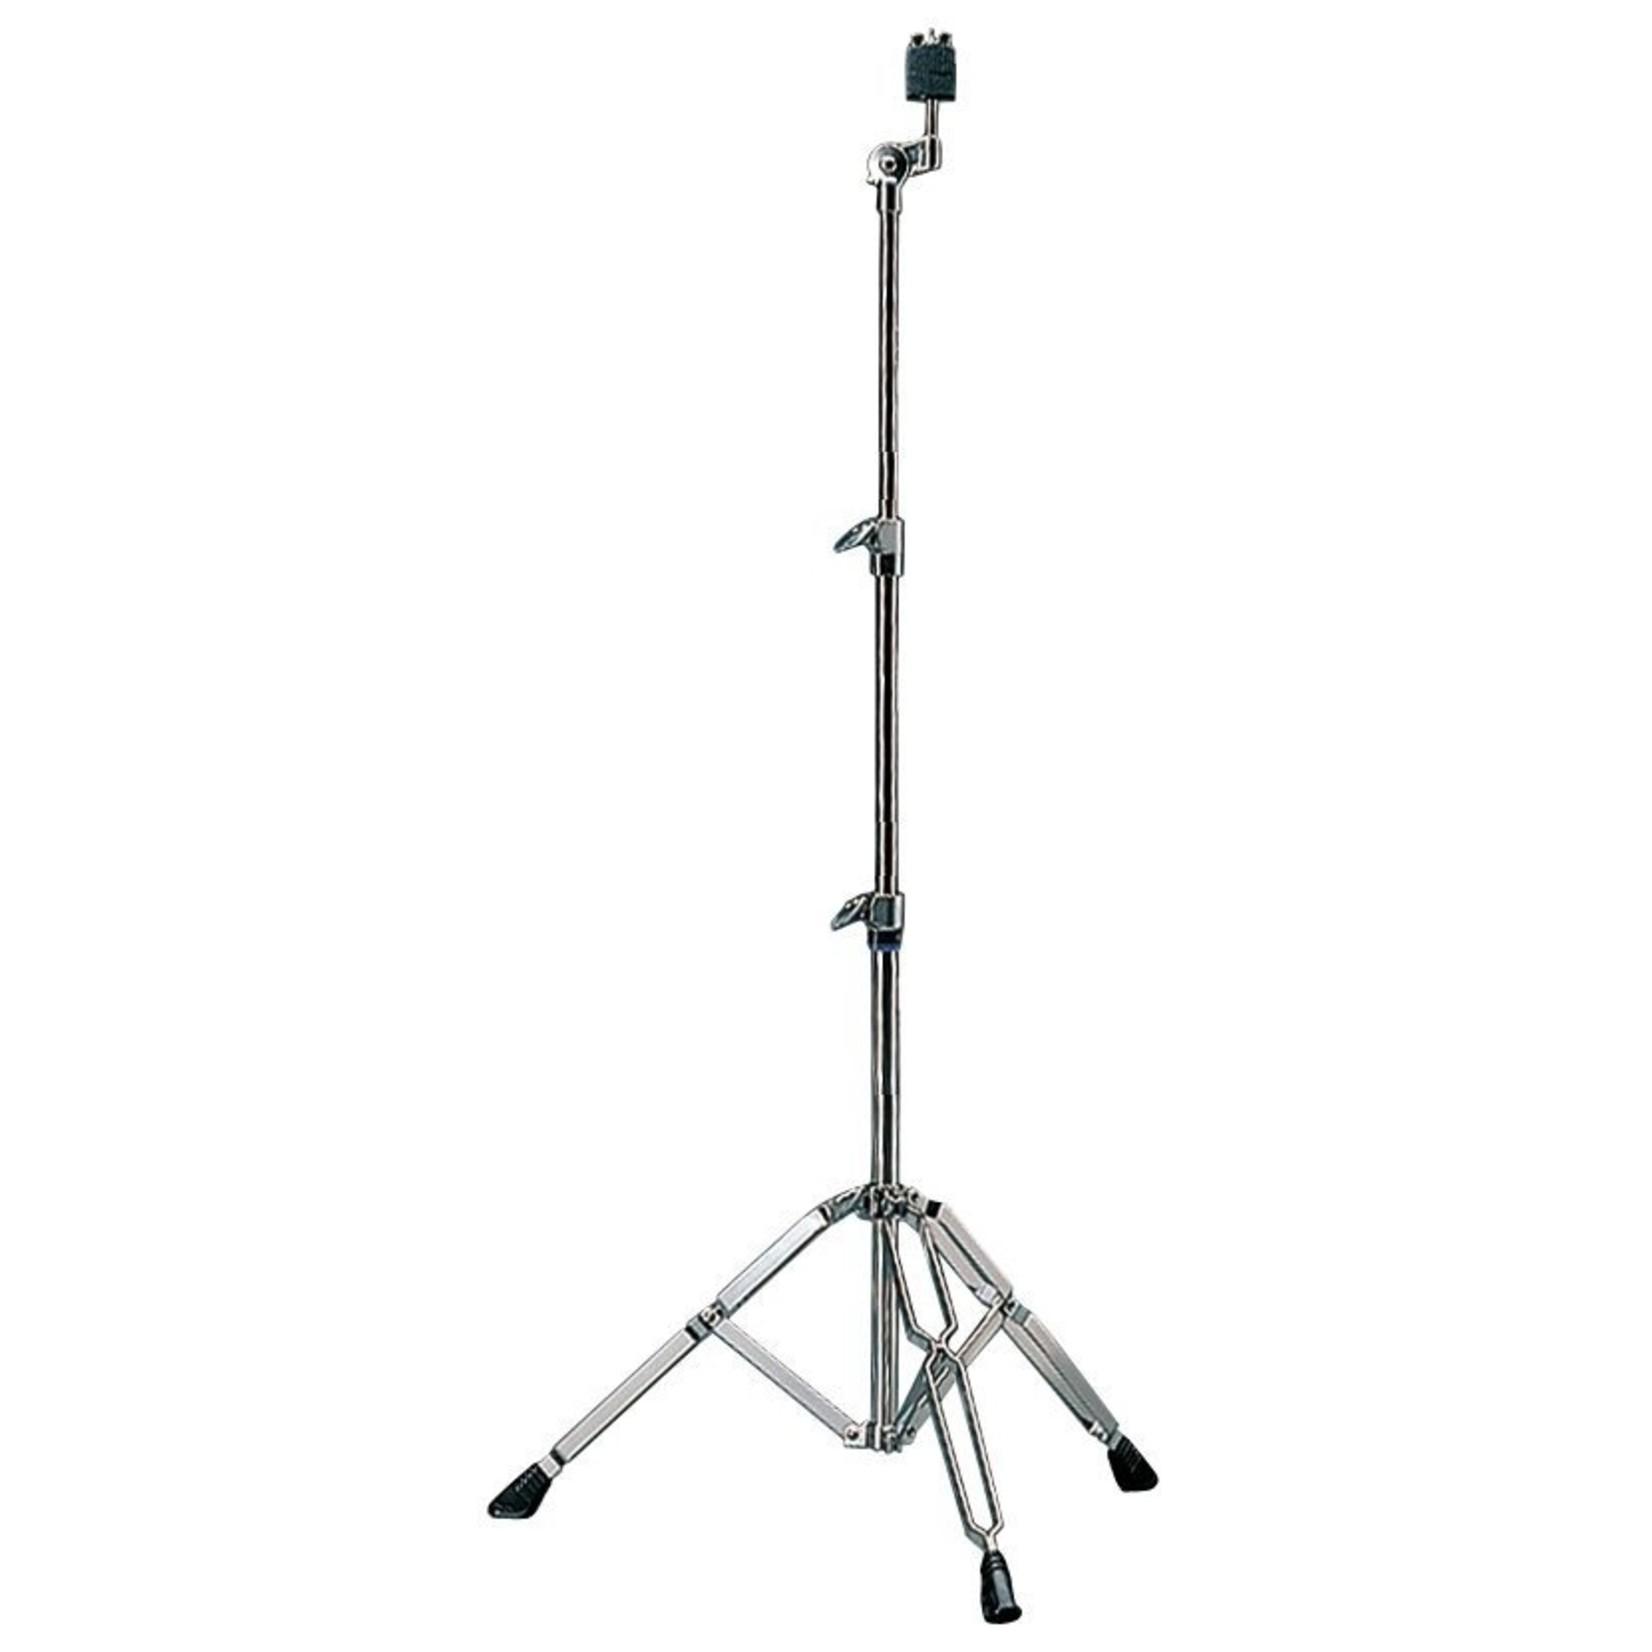 Yamaha Yamaha Cymbal Stand - Medium Weight - Single Braced